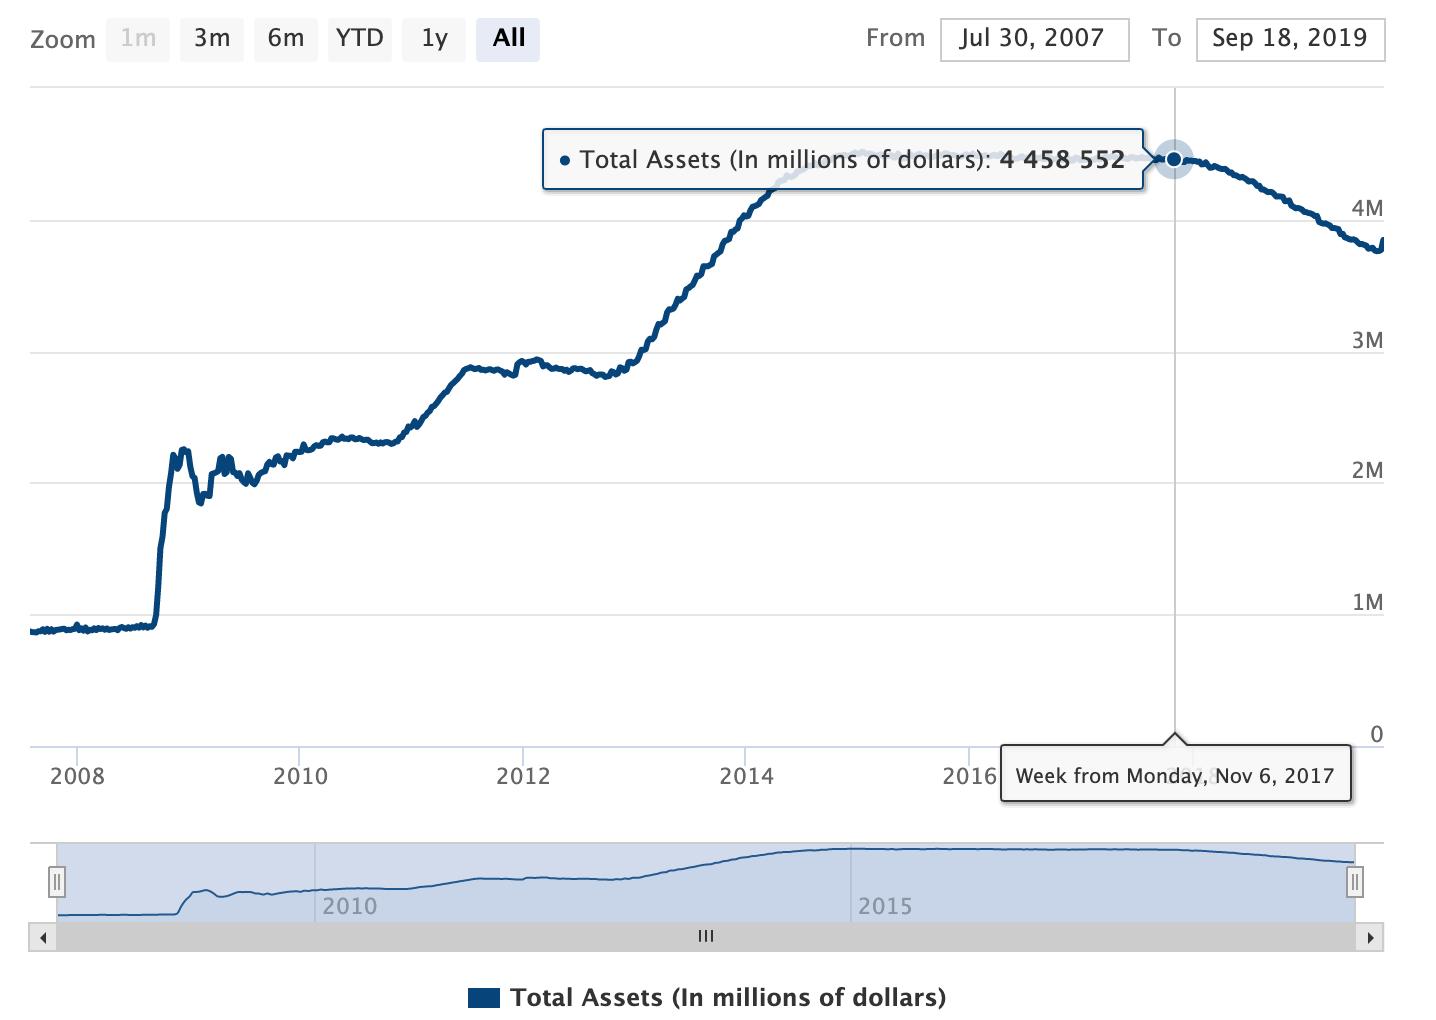 https://www.federalreserve.gov/monetarypolicy/bst_recenttrends.htm